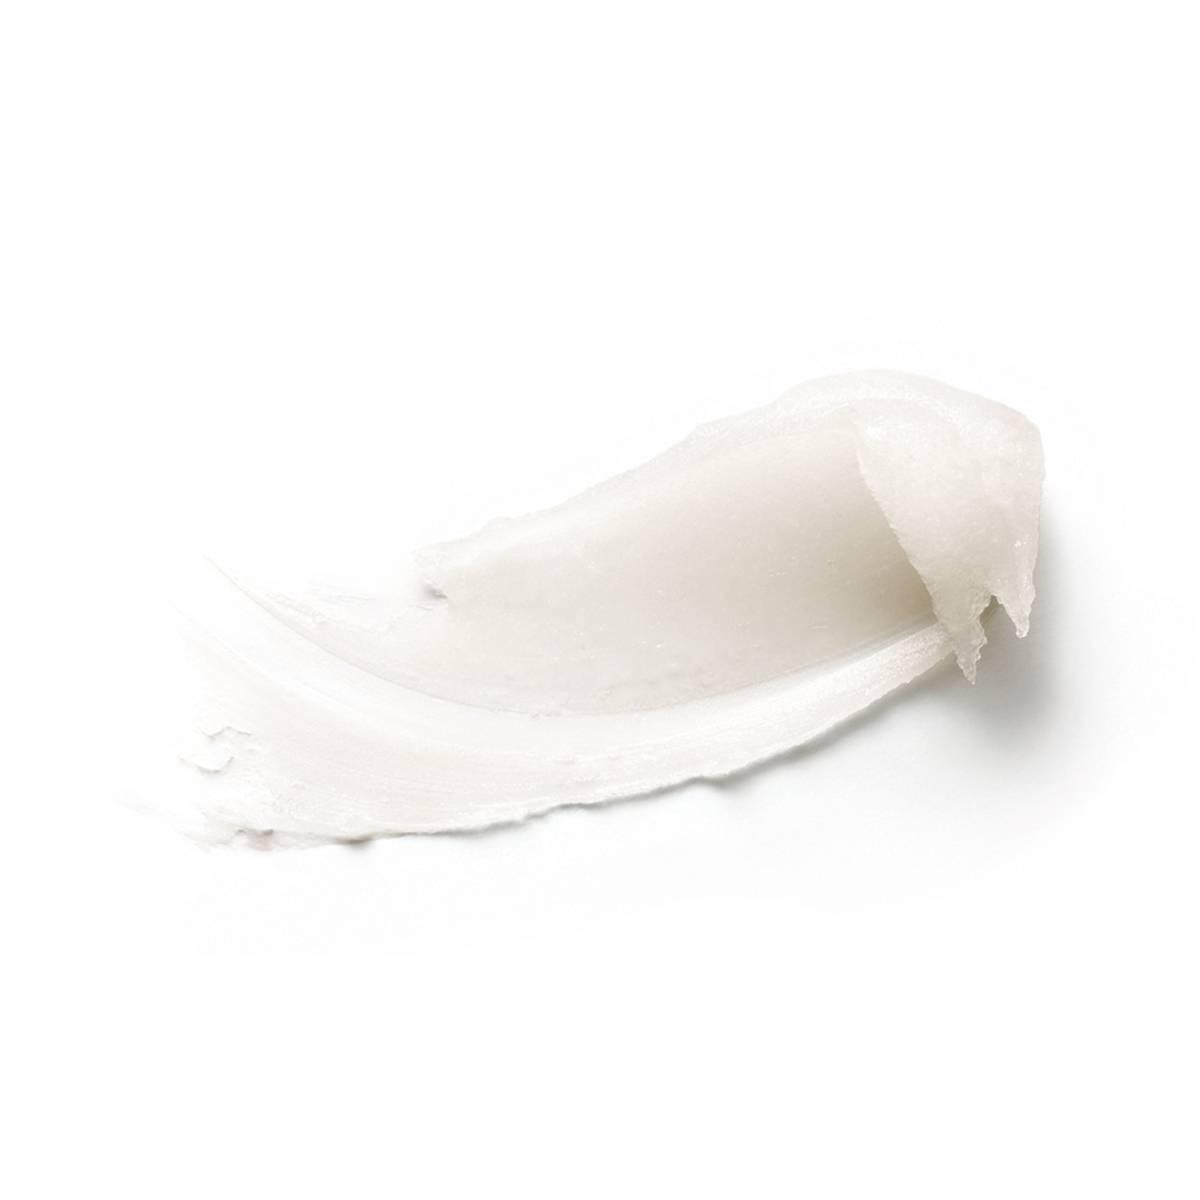 La Roche Posay ProduktSide Skadet Cicaplast Lip Balm Texture